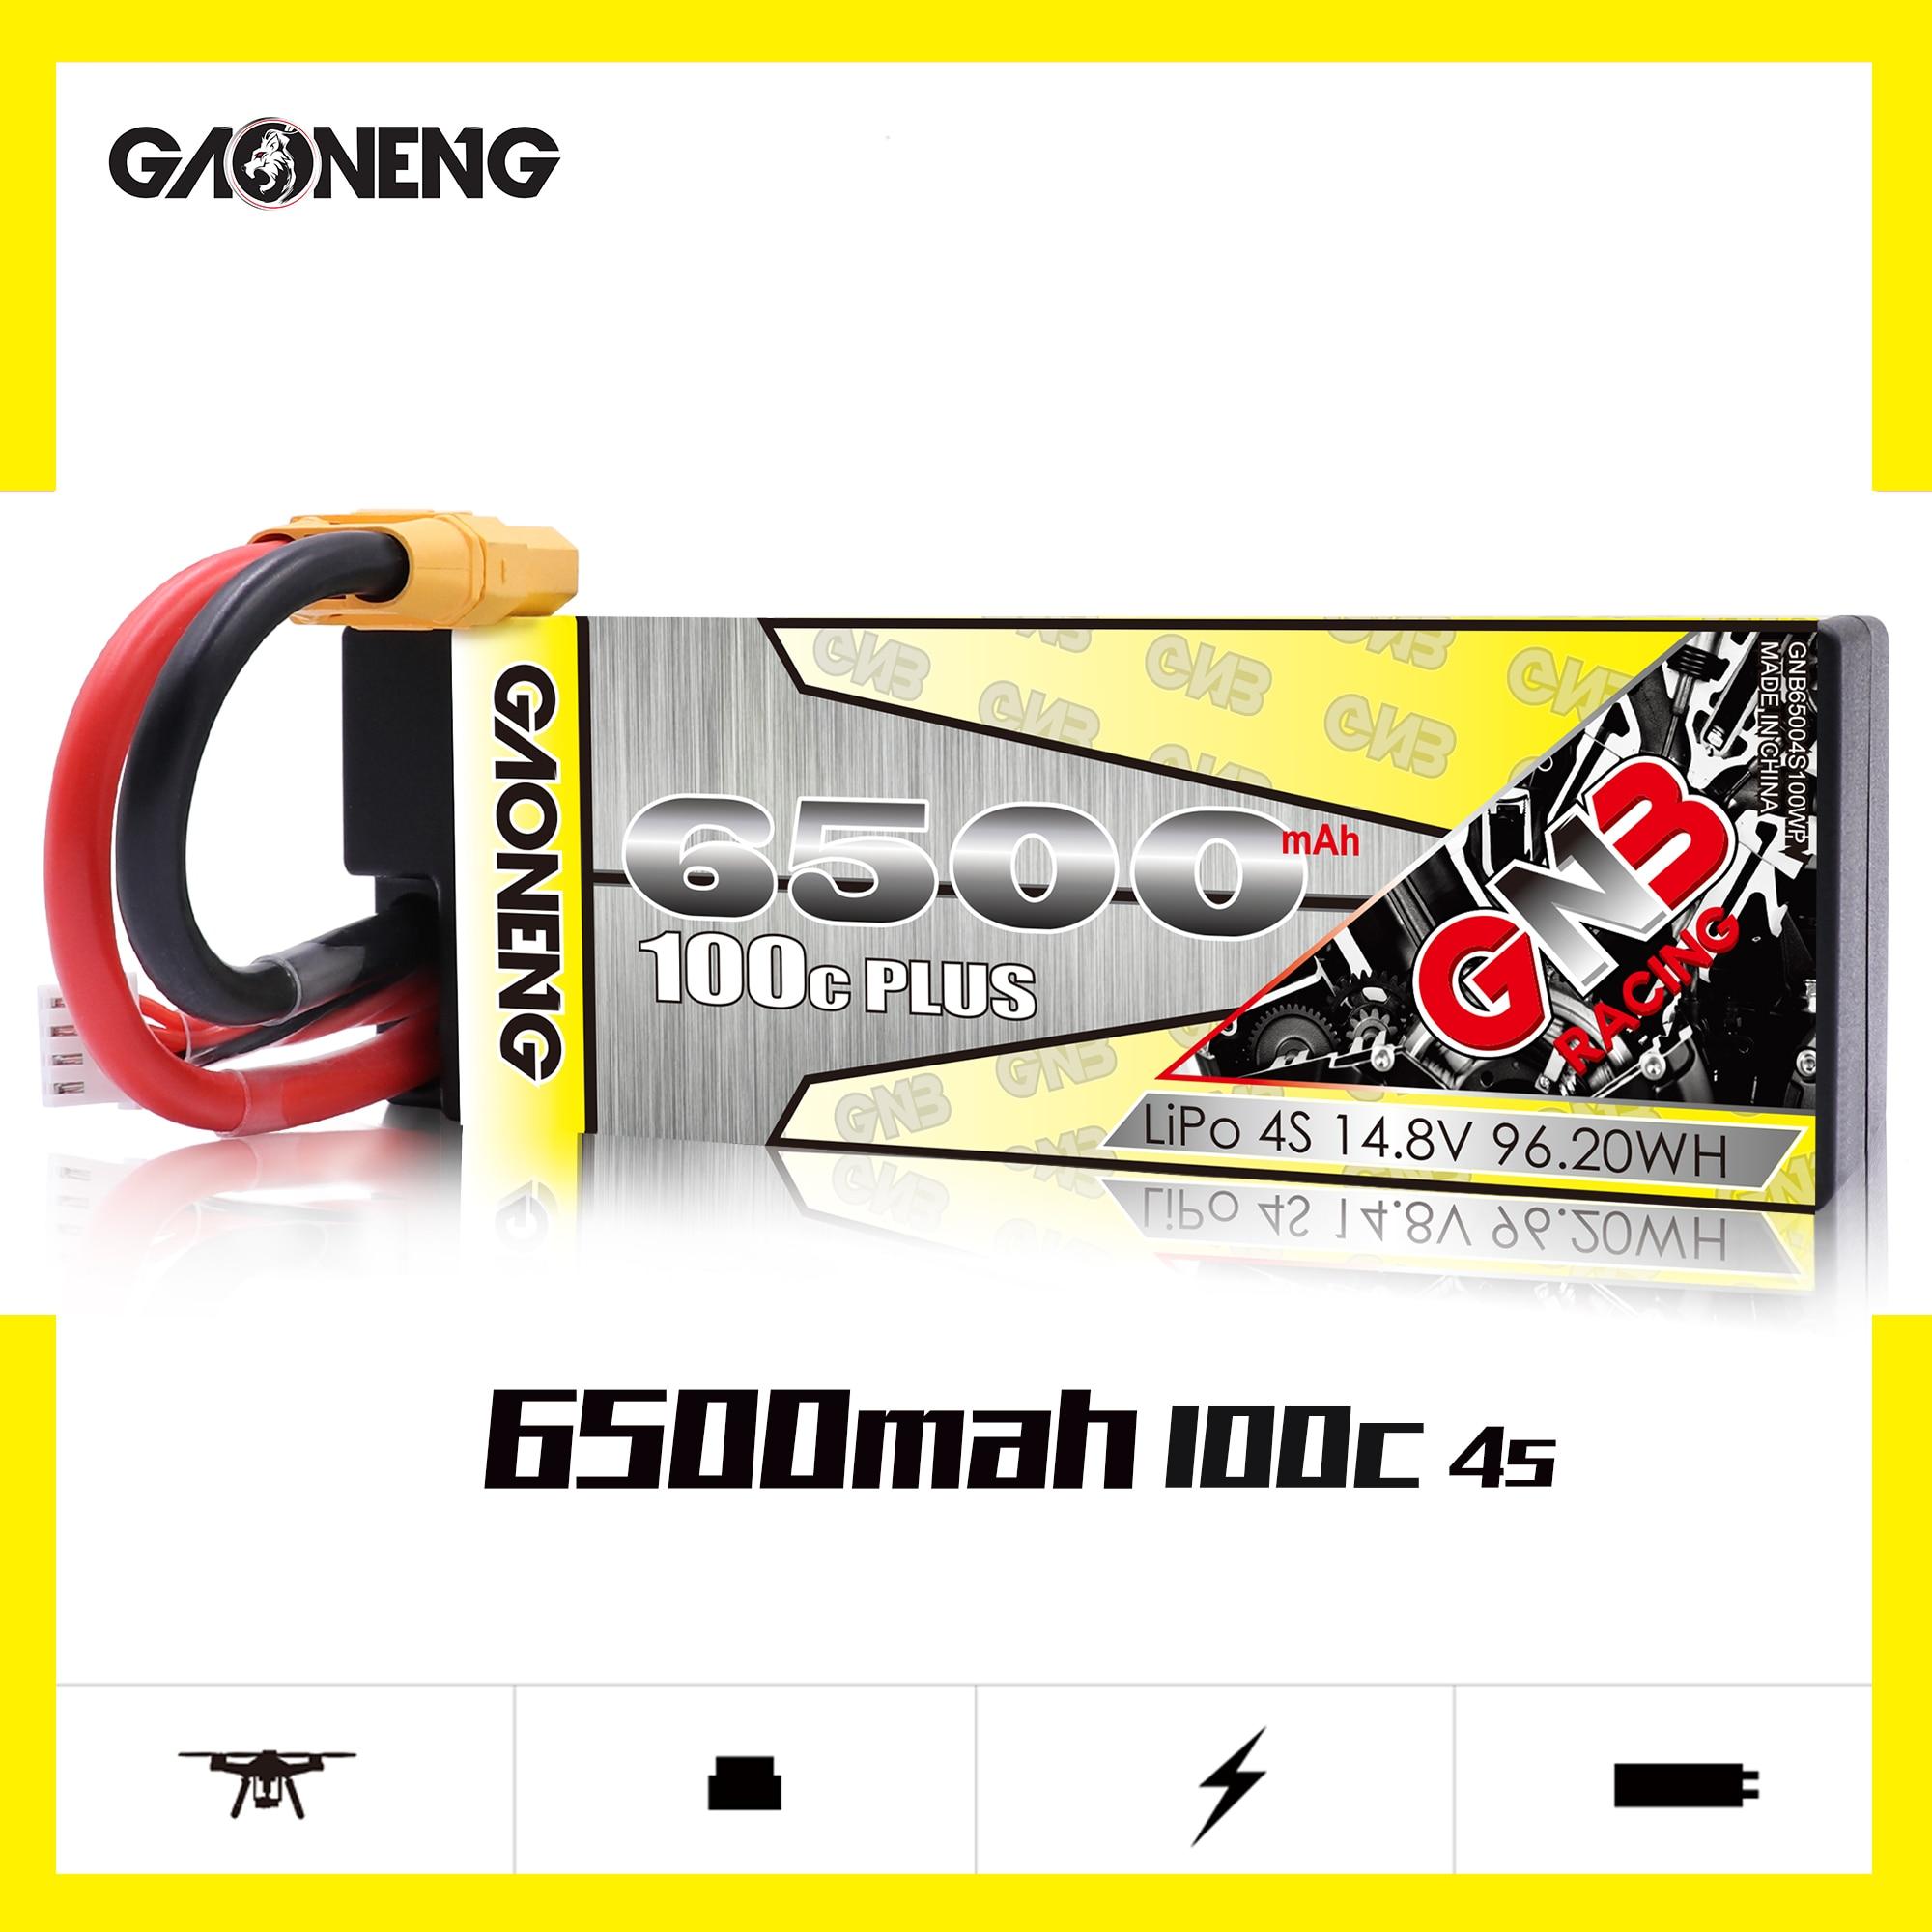 Gaoneng gnb 6500 mah 4S 14.8 v 100c mais bateria lipo hardcase com t/xt90/xt60 plug para 18 1/8 rc carro quatro carro fora de estrada rc carro